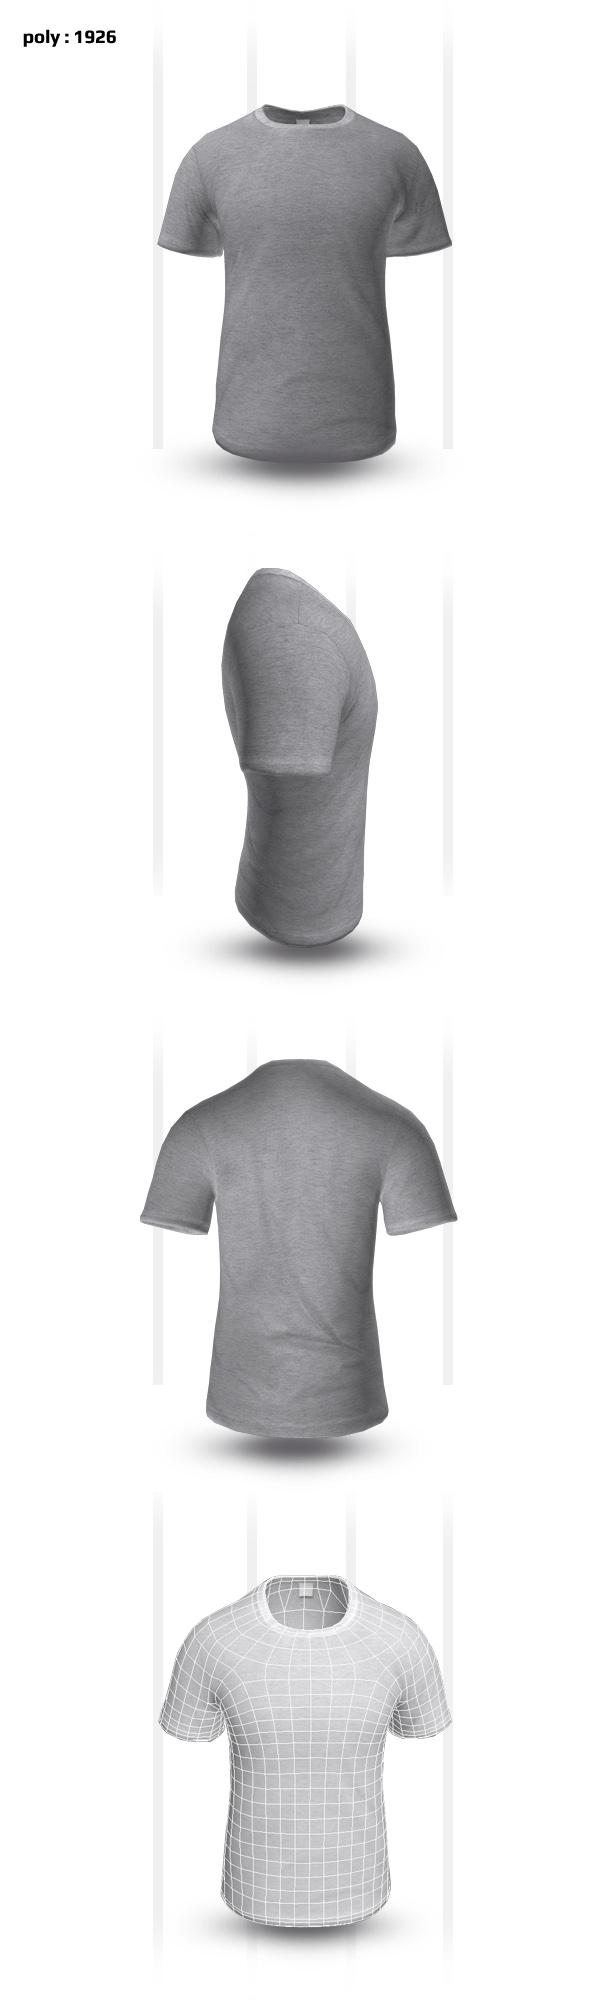 T- Shirt - 3DOcean Item for Sale